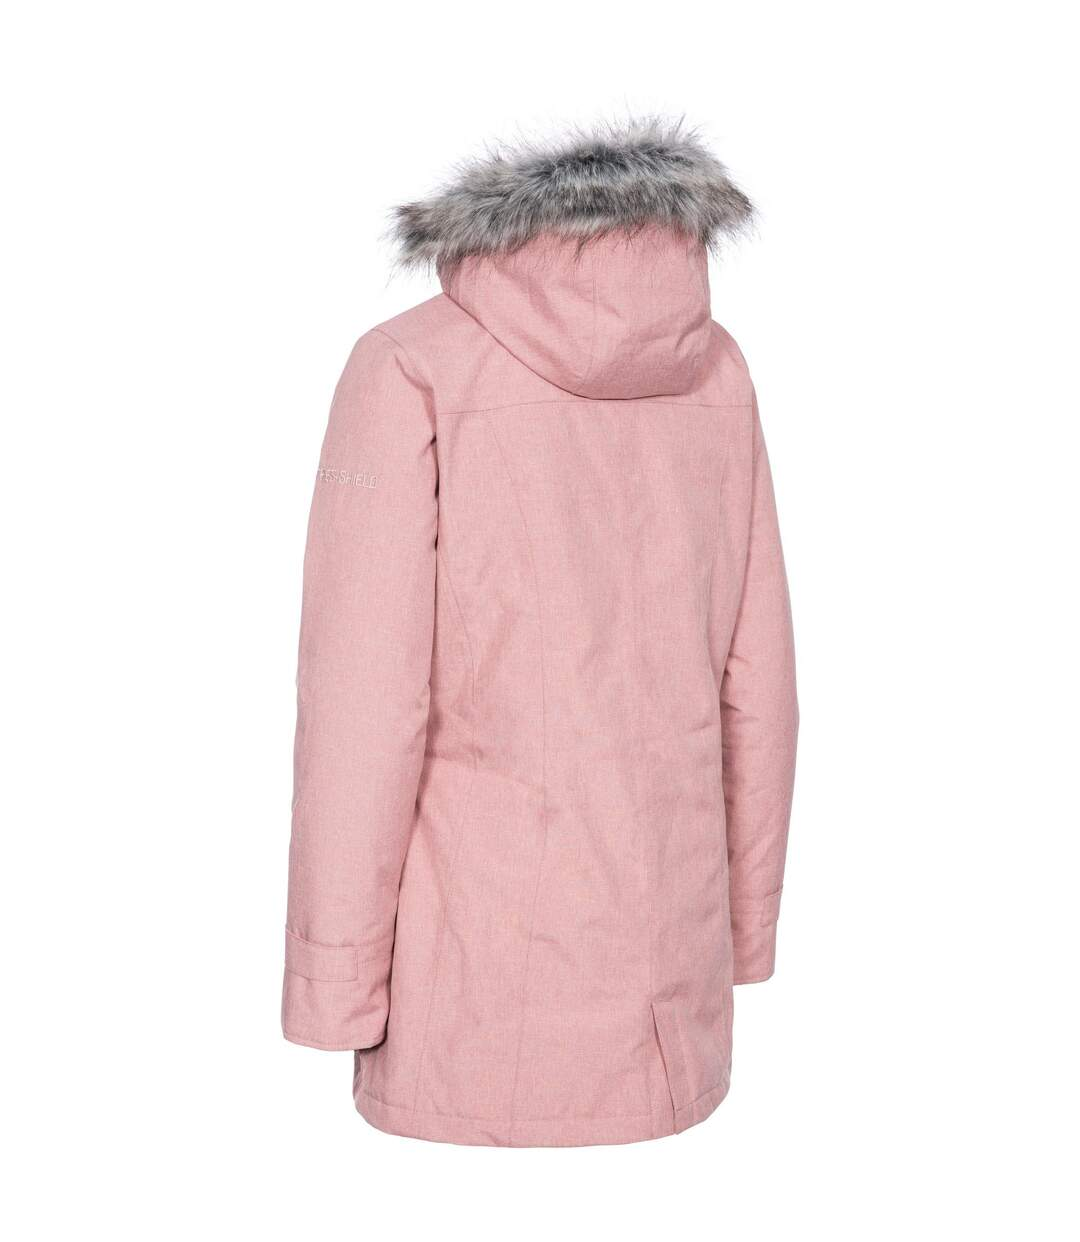 Trespass Womens/Ladies Daybyday Waterproof Jacket (Dusty Rose) - UTTP4759